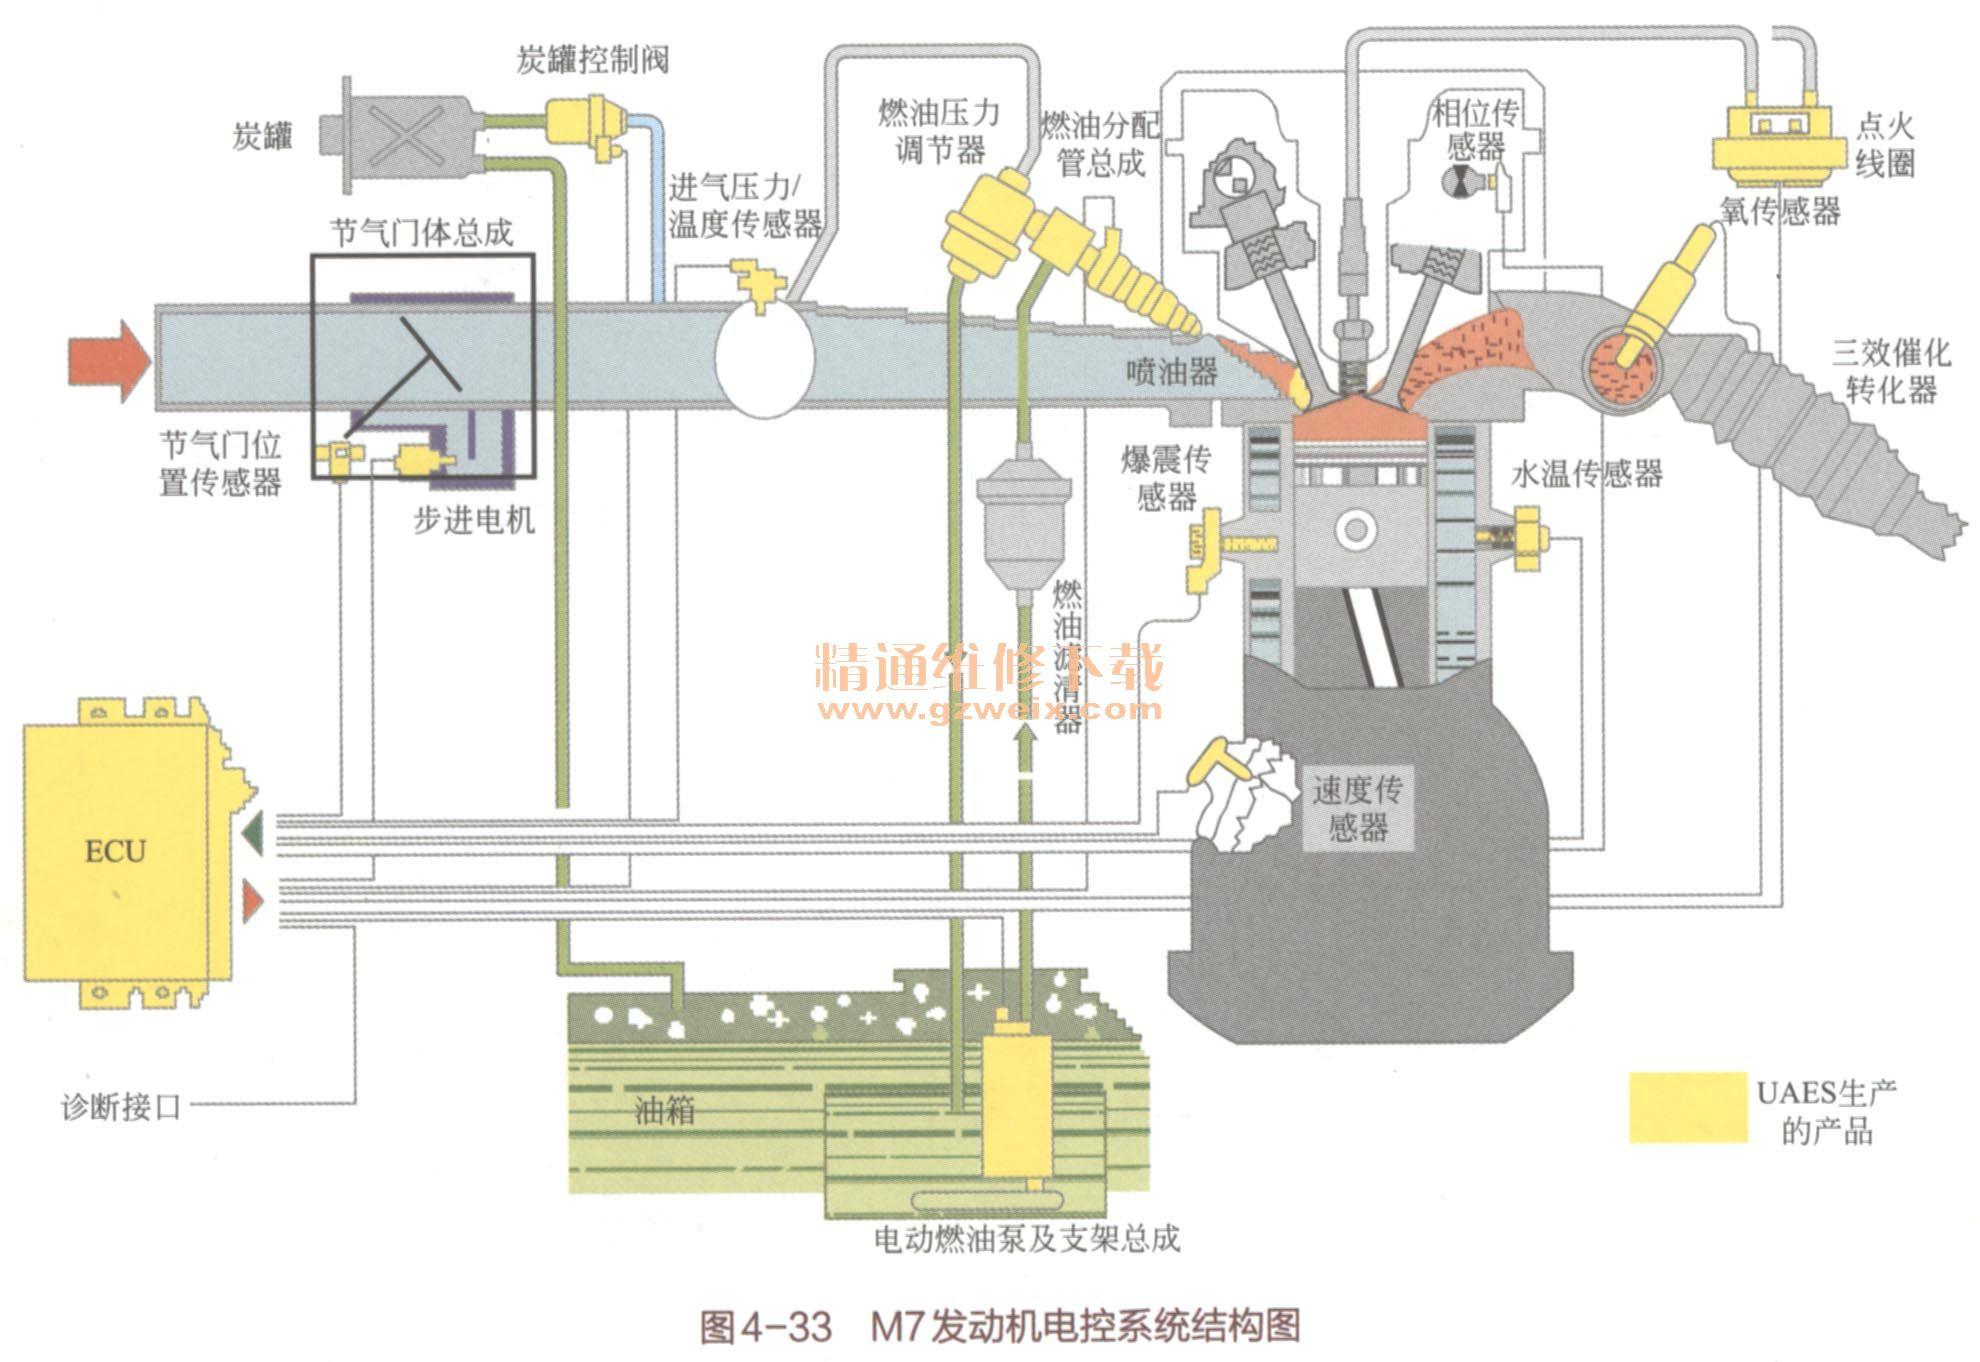 m7发动机电控系统结构图